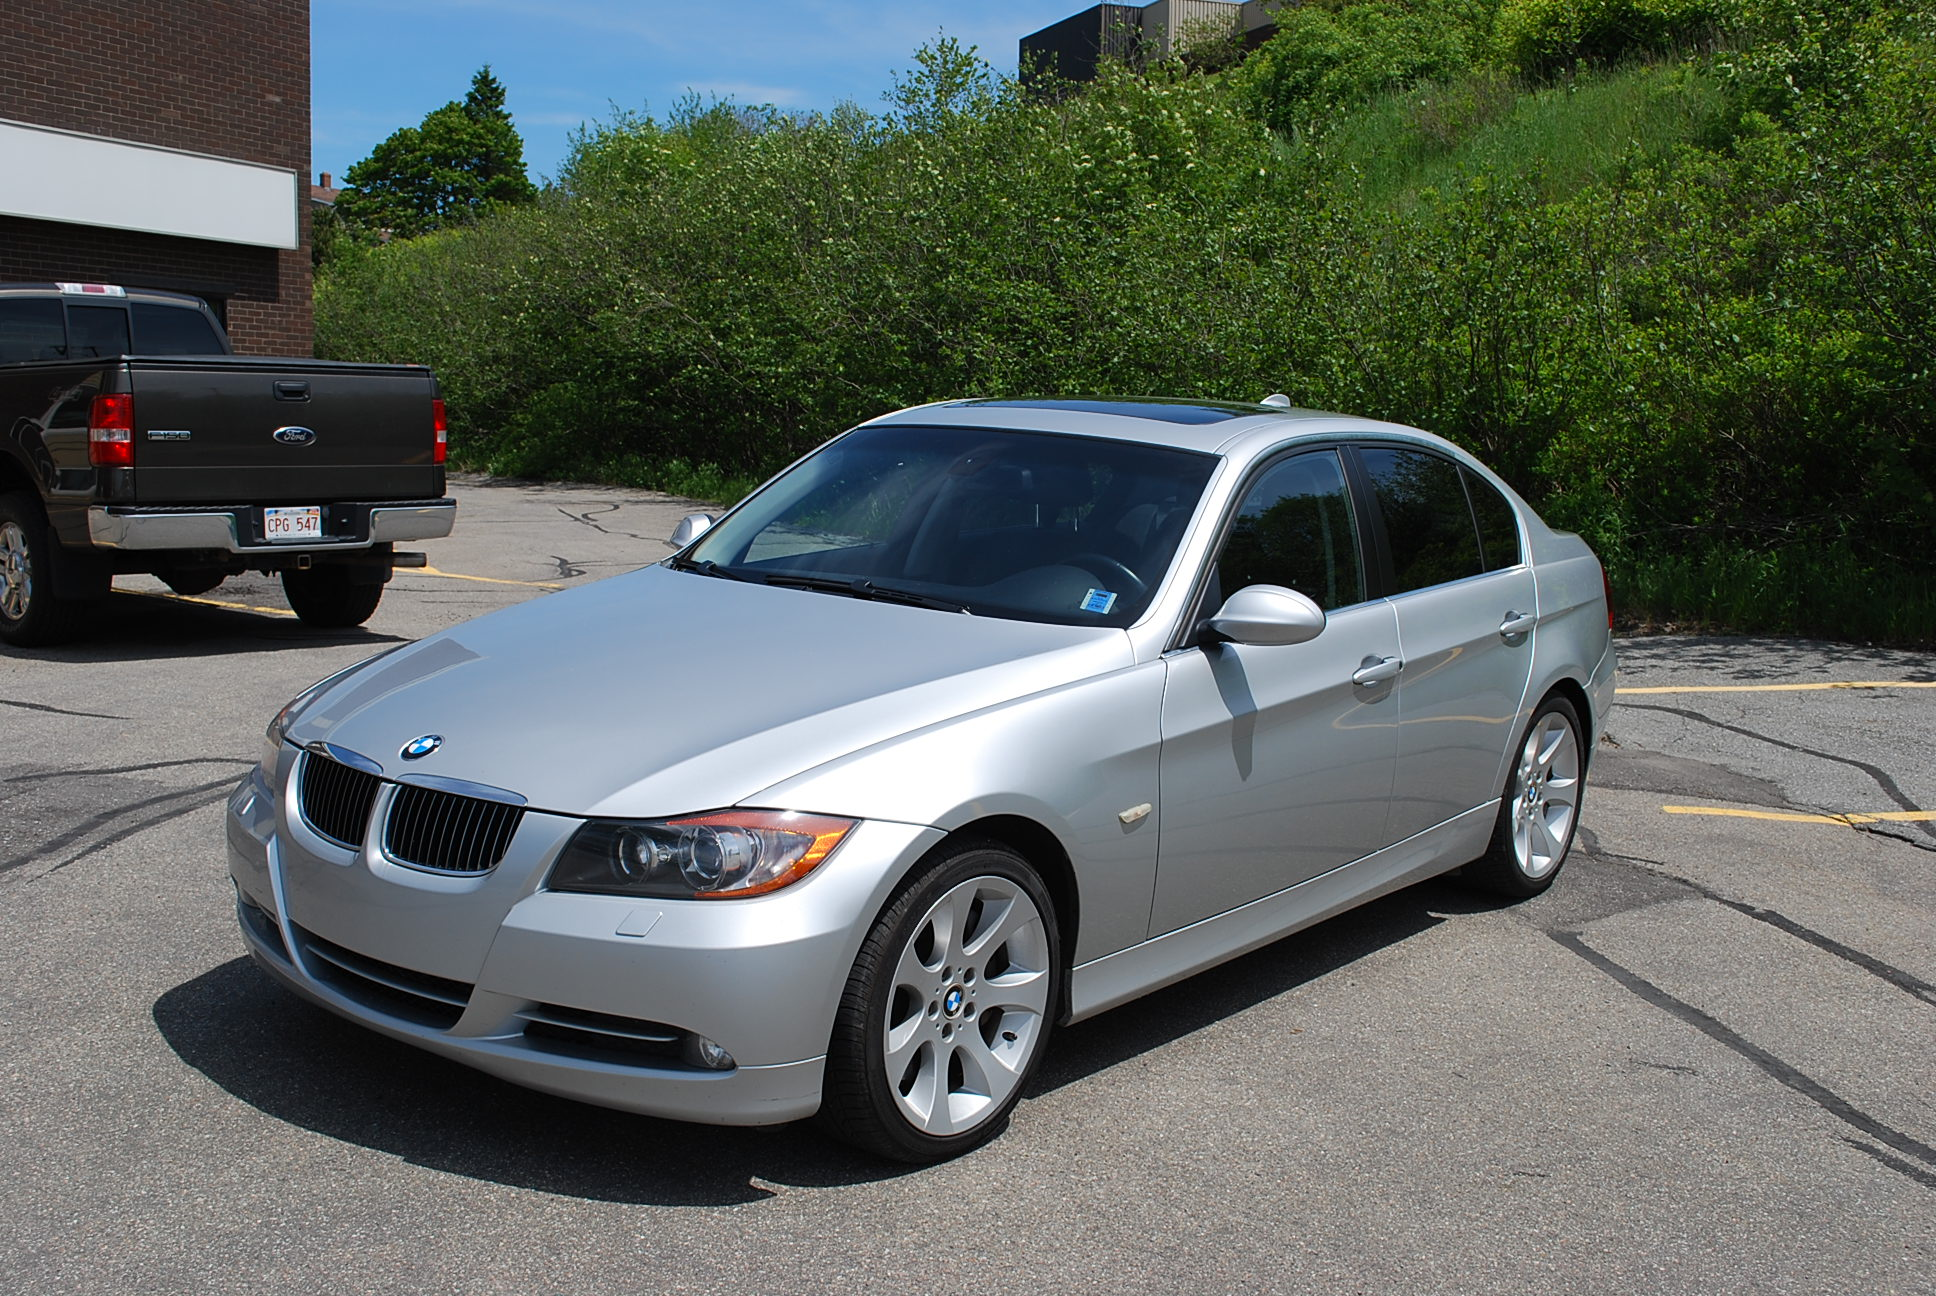 Used 2008 Bmw 335i X Drive For Sale In Saint John Nb